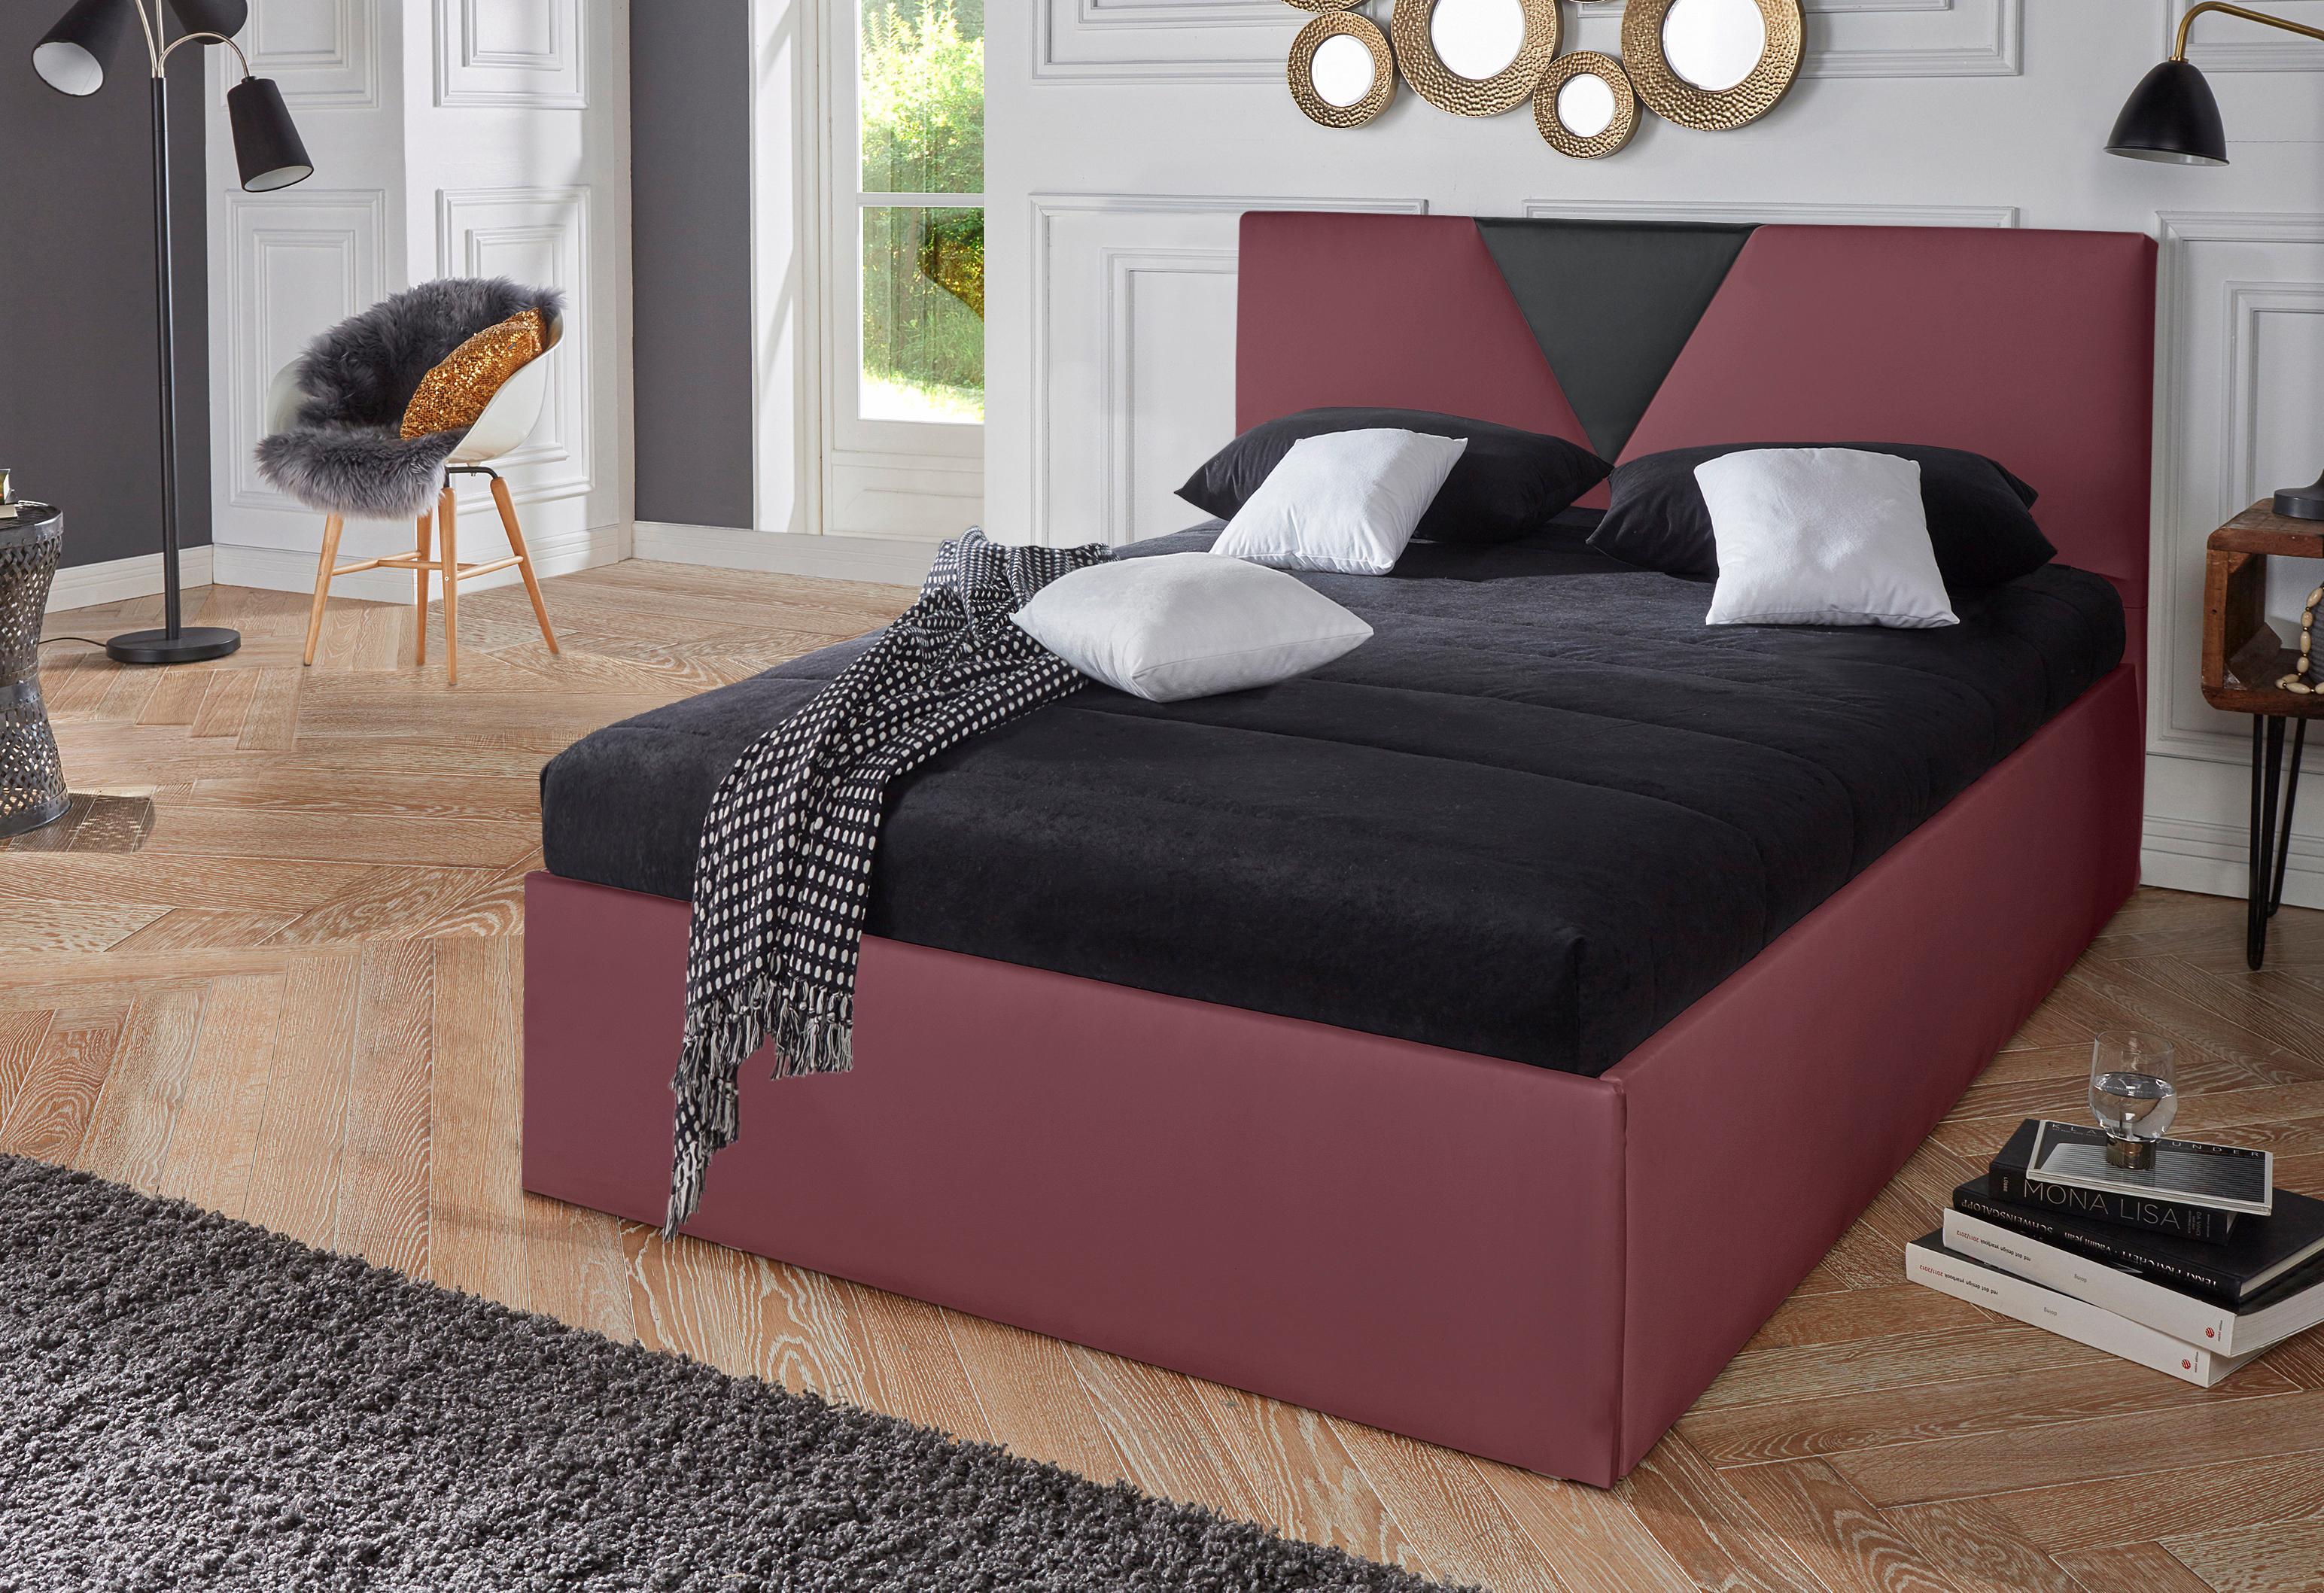 Westfalia Schlafkomfort Polsterbett Malibu   Schlafzimmer > Betten > Polsterbetten   Rot   Westfalia Schlafkomfort